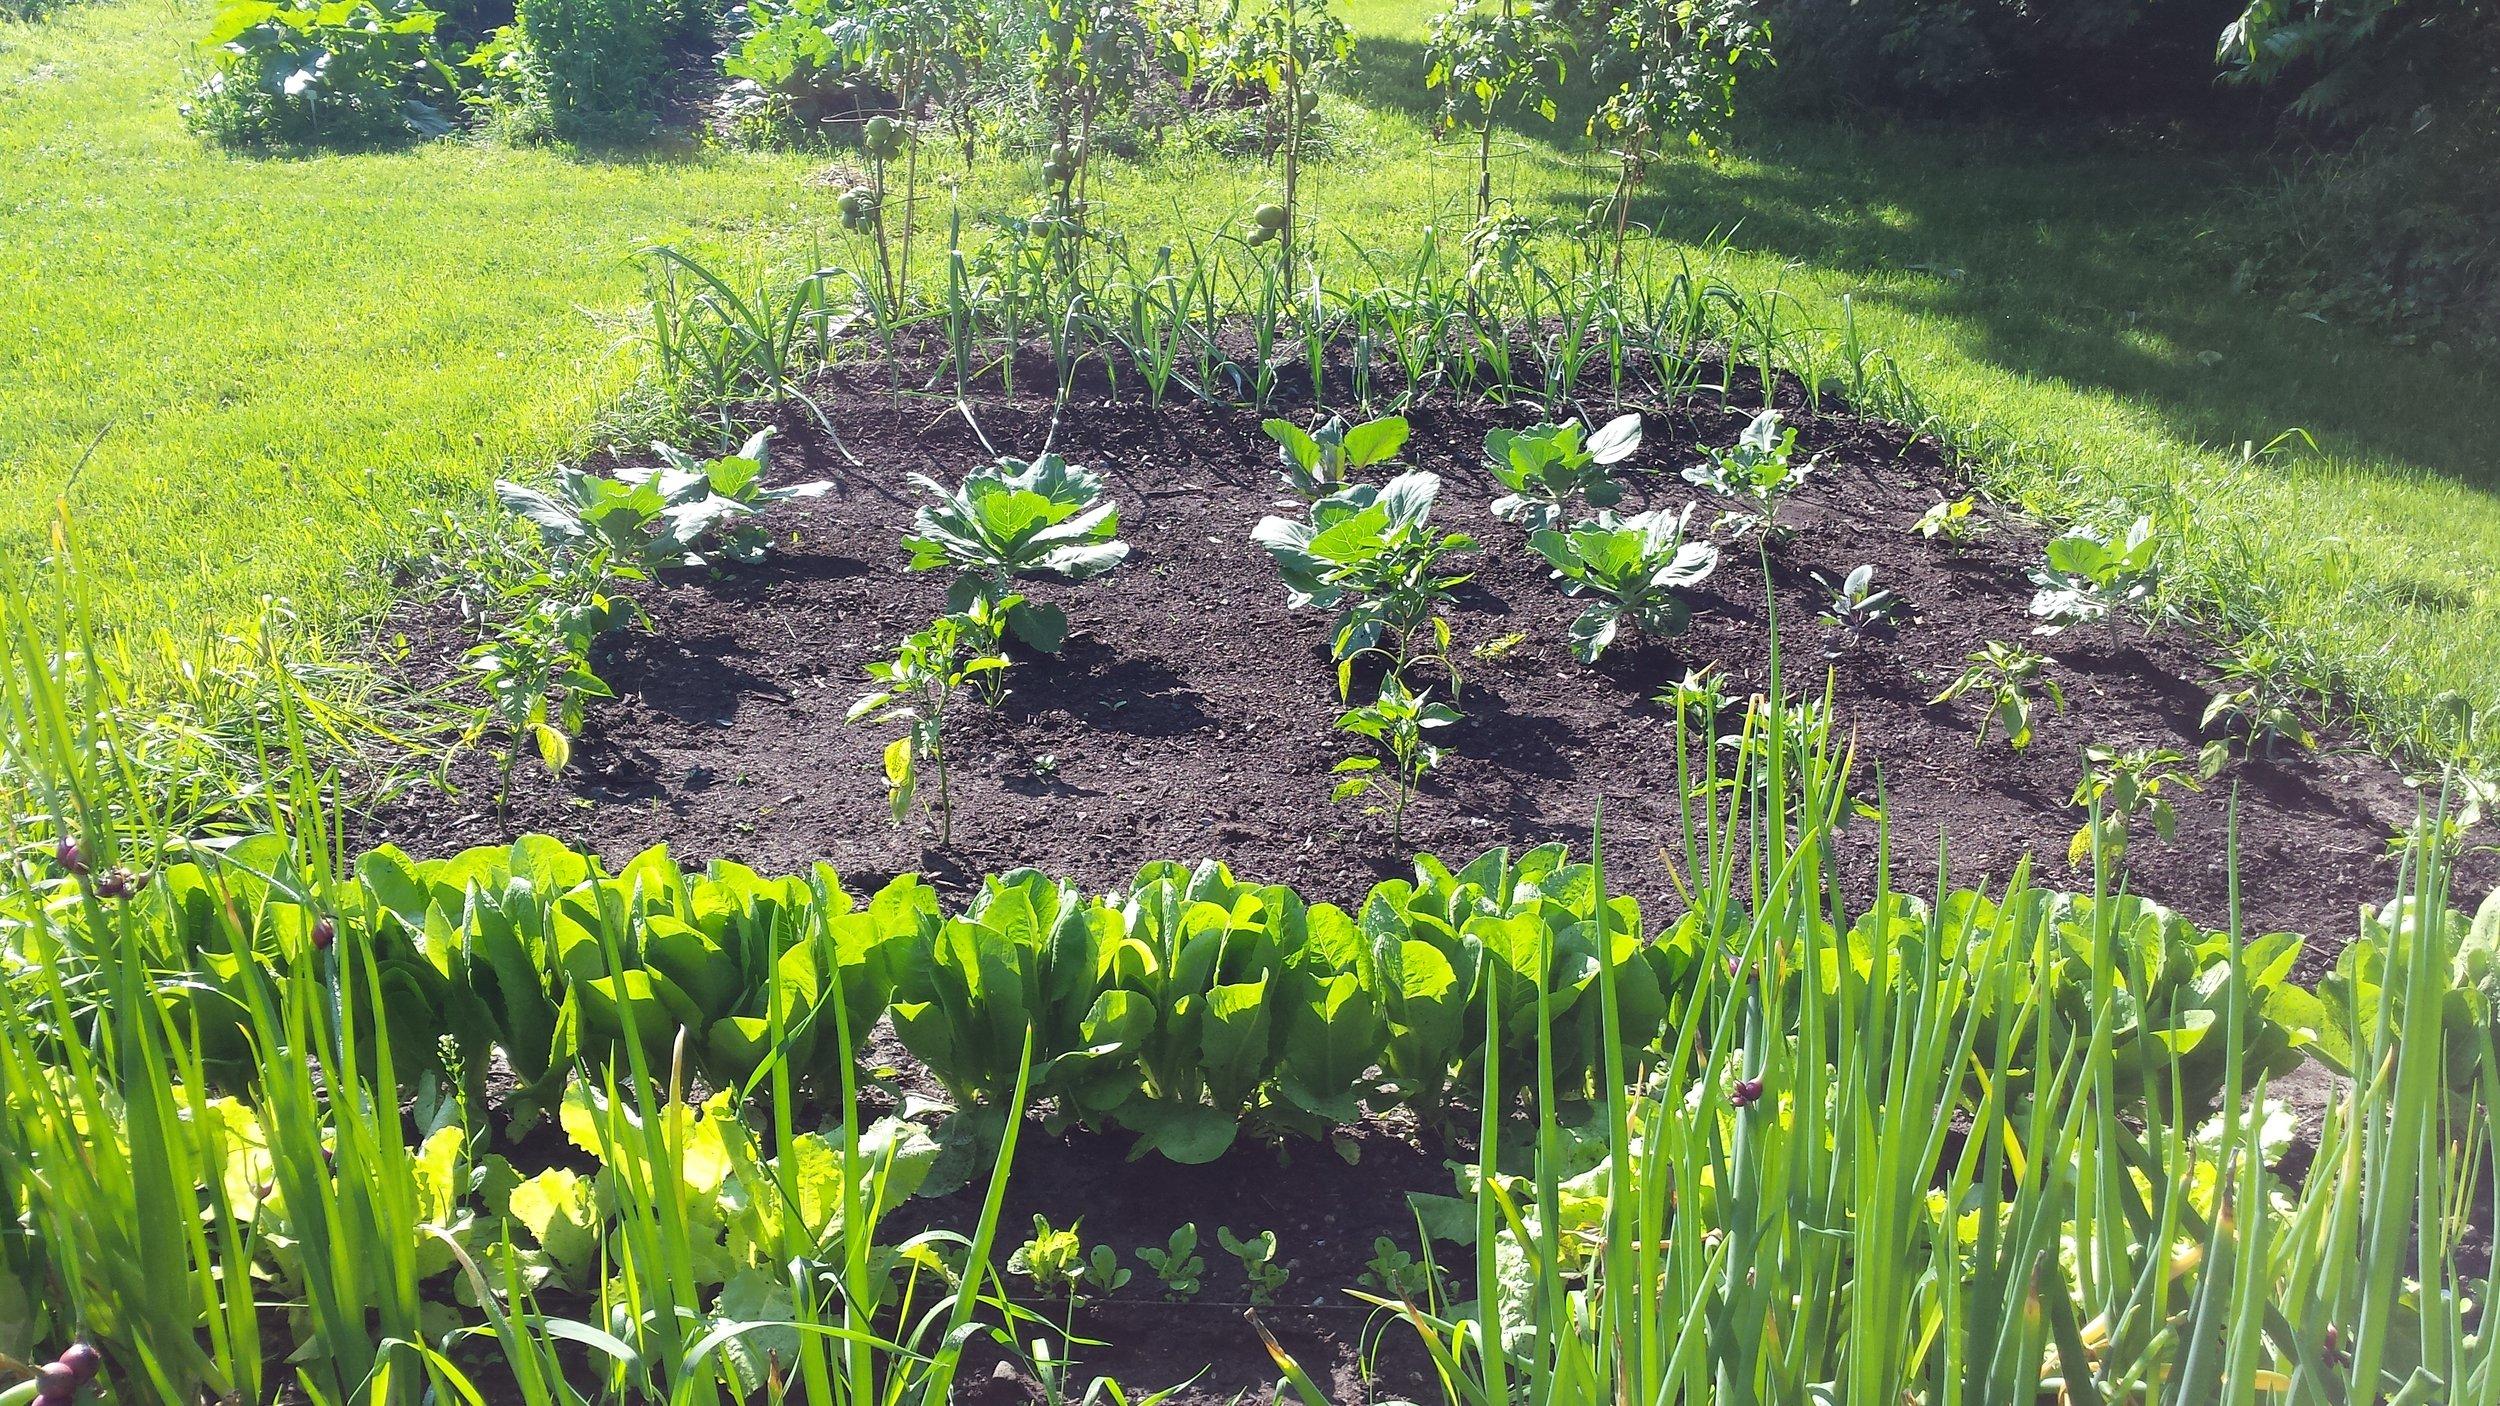 A flourishing garden on hospital grounds.